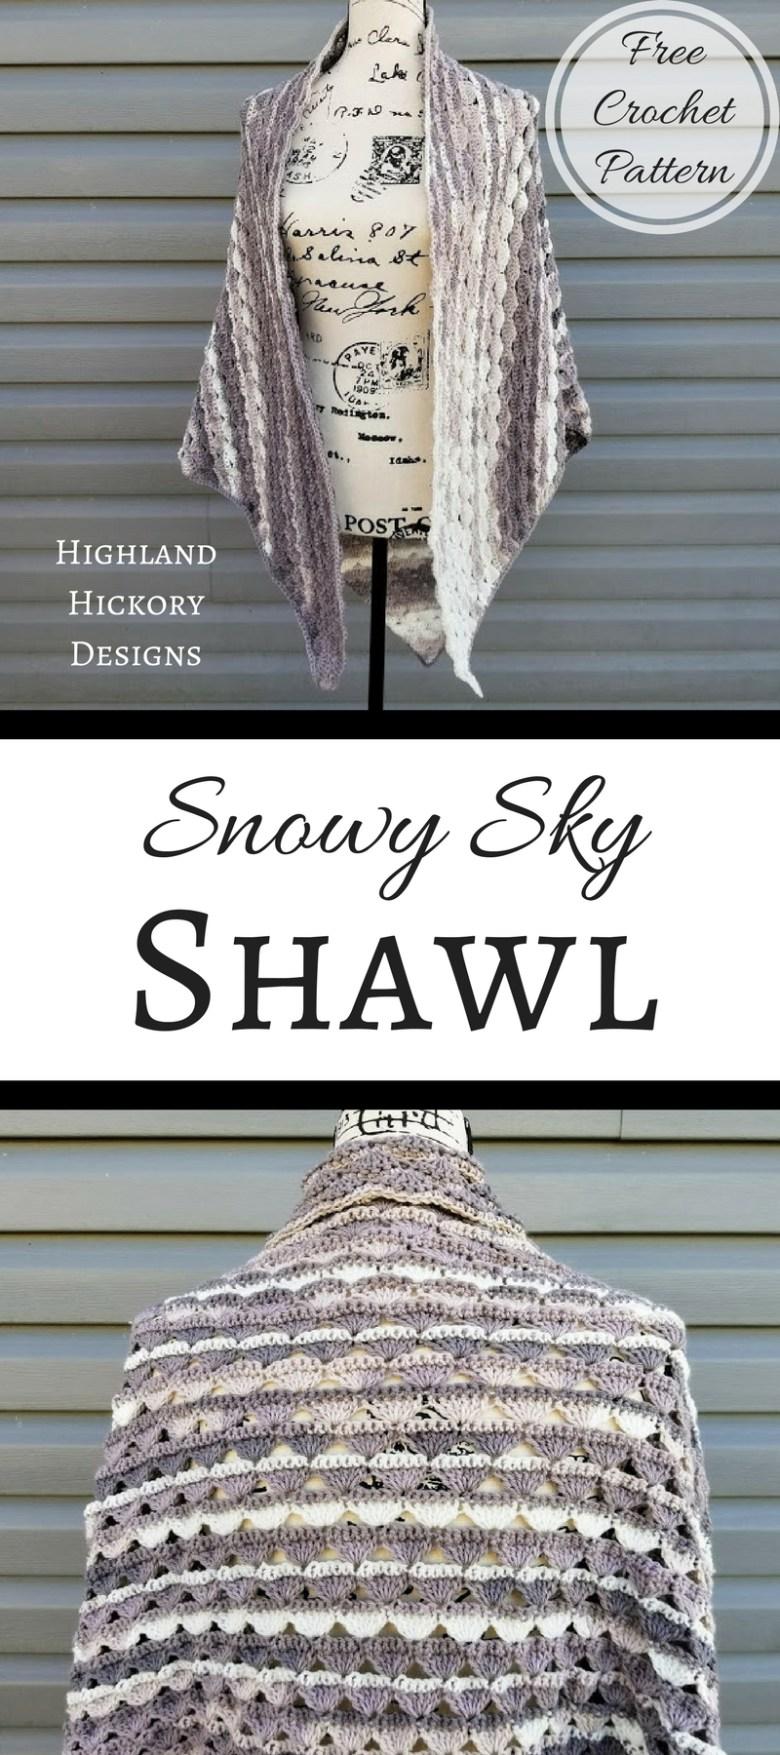 Snowy Sky Shawl Highland Hickory Designs Free Crochet